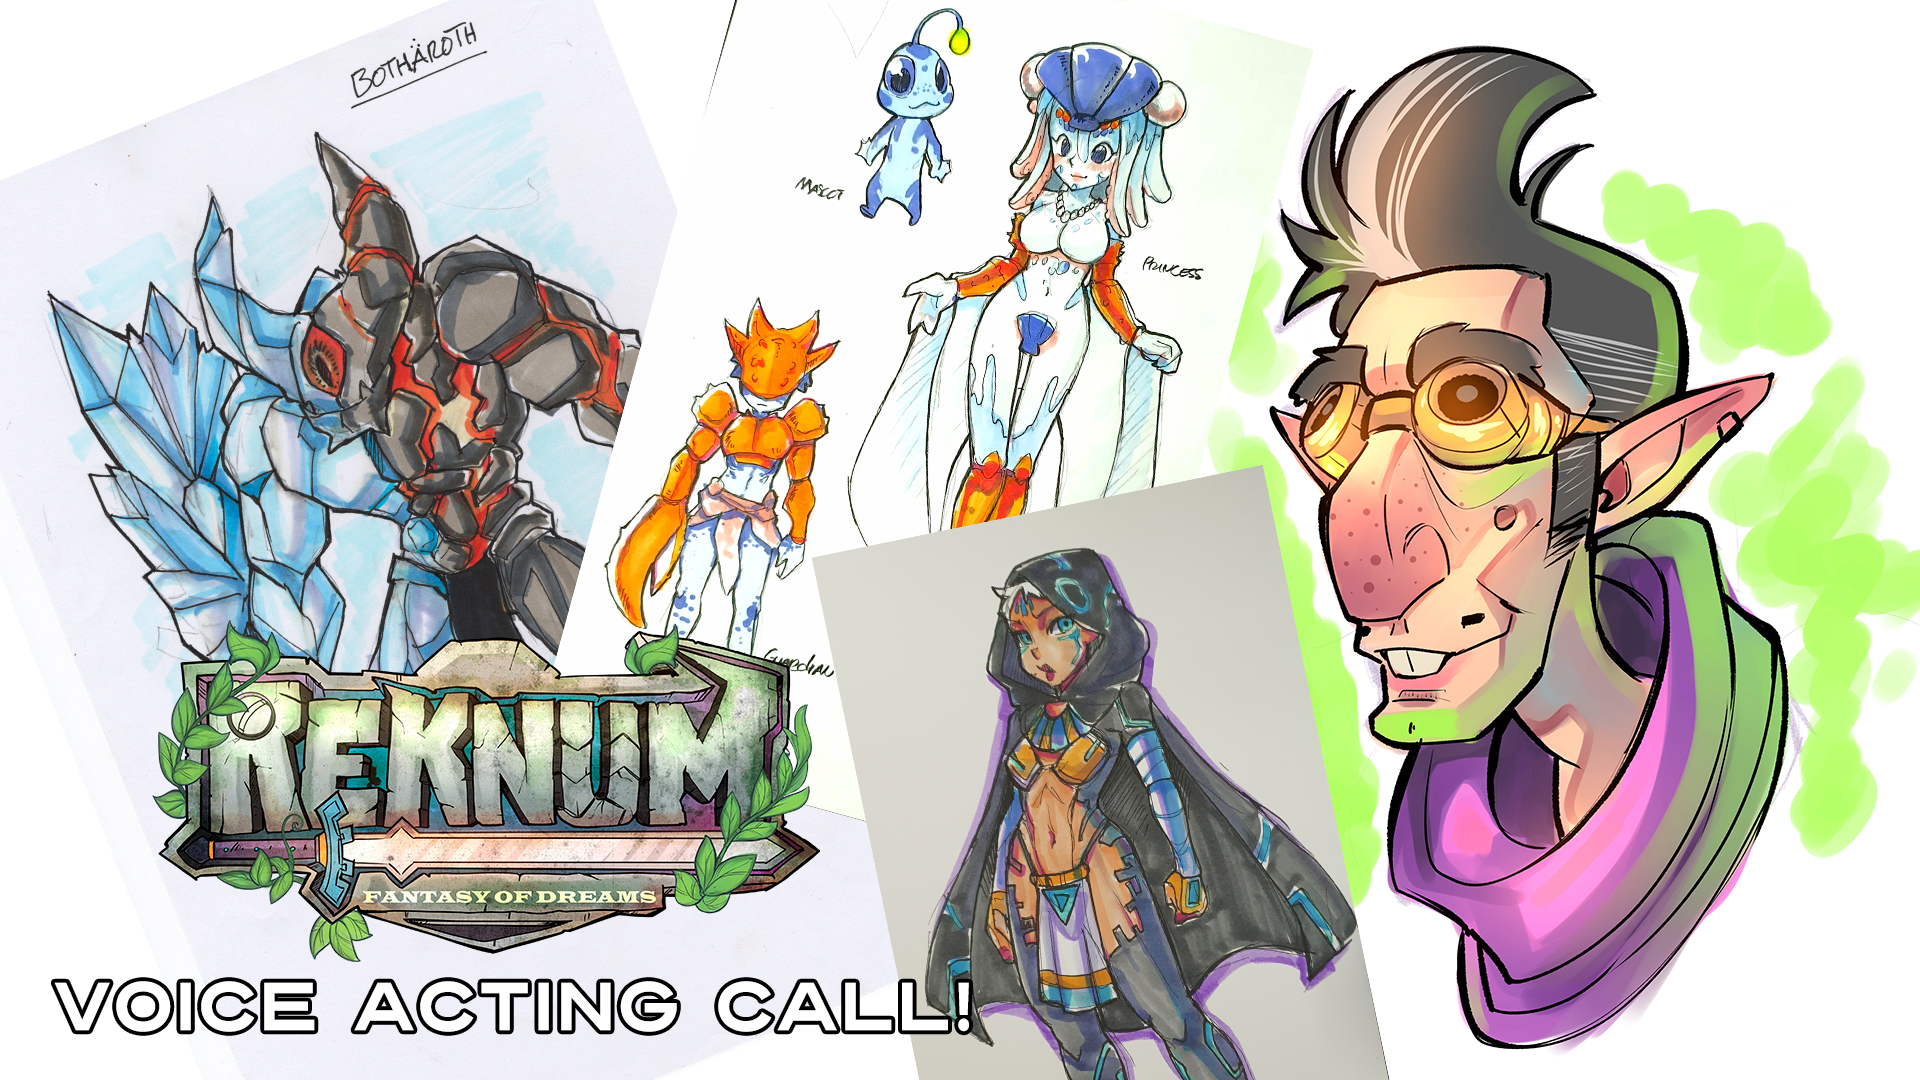 Voice acting call for Reknum Fantasy of Dreams